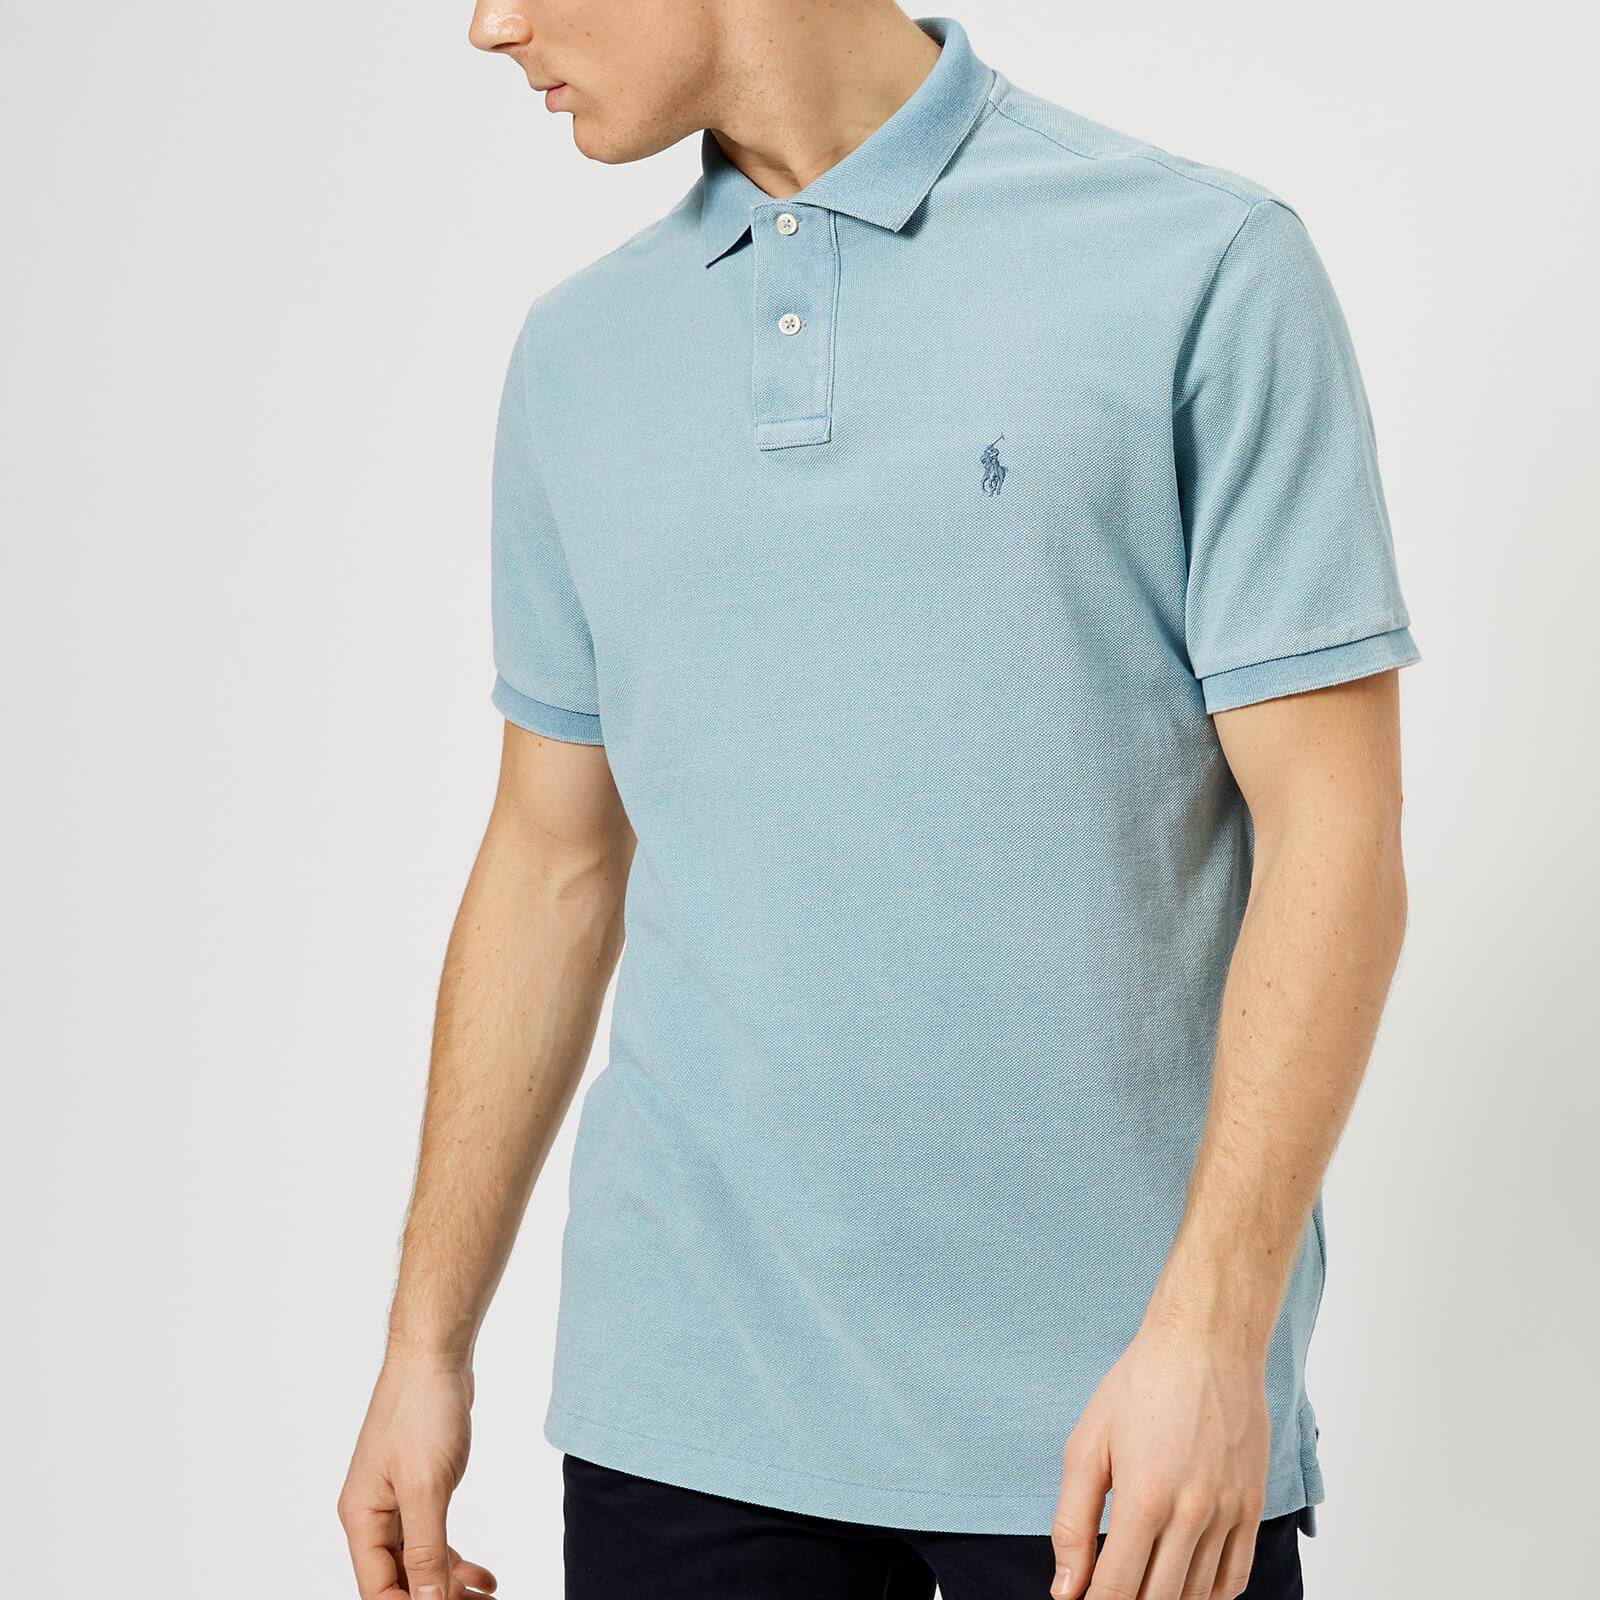 5ebbdfc1 Polo Ralph Lauren Men's Short Sleeve Polo Shirt - Light Indigo - Free UK  Delivery over £50